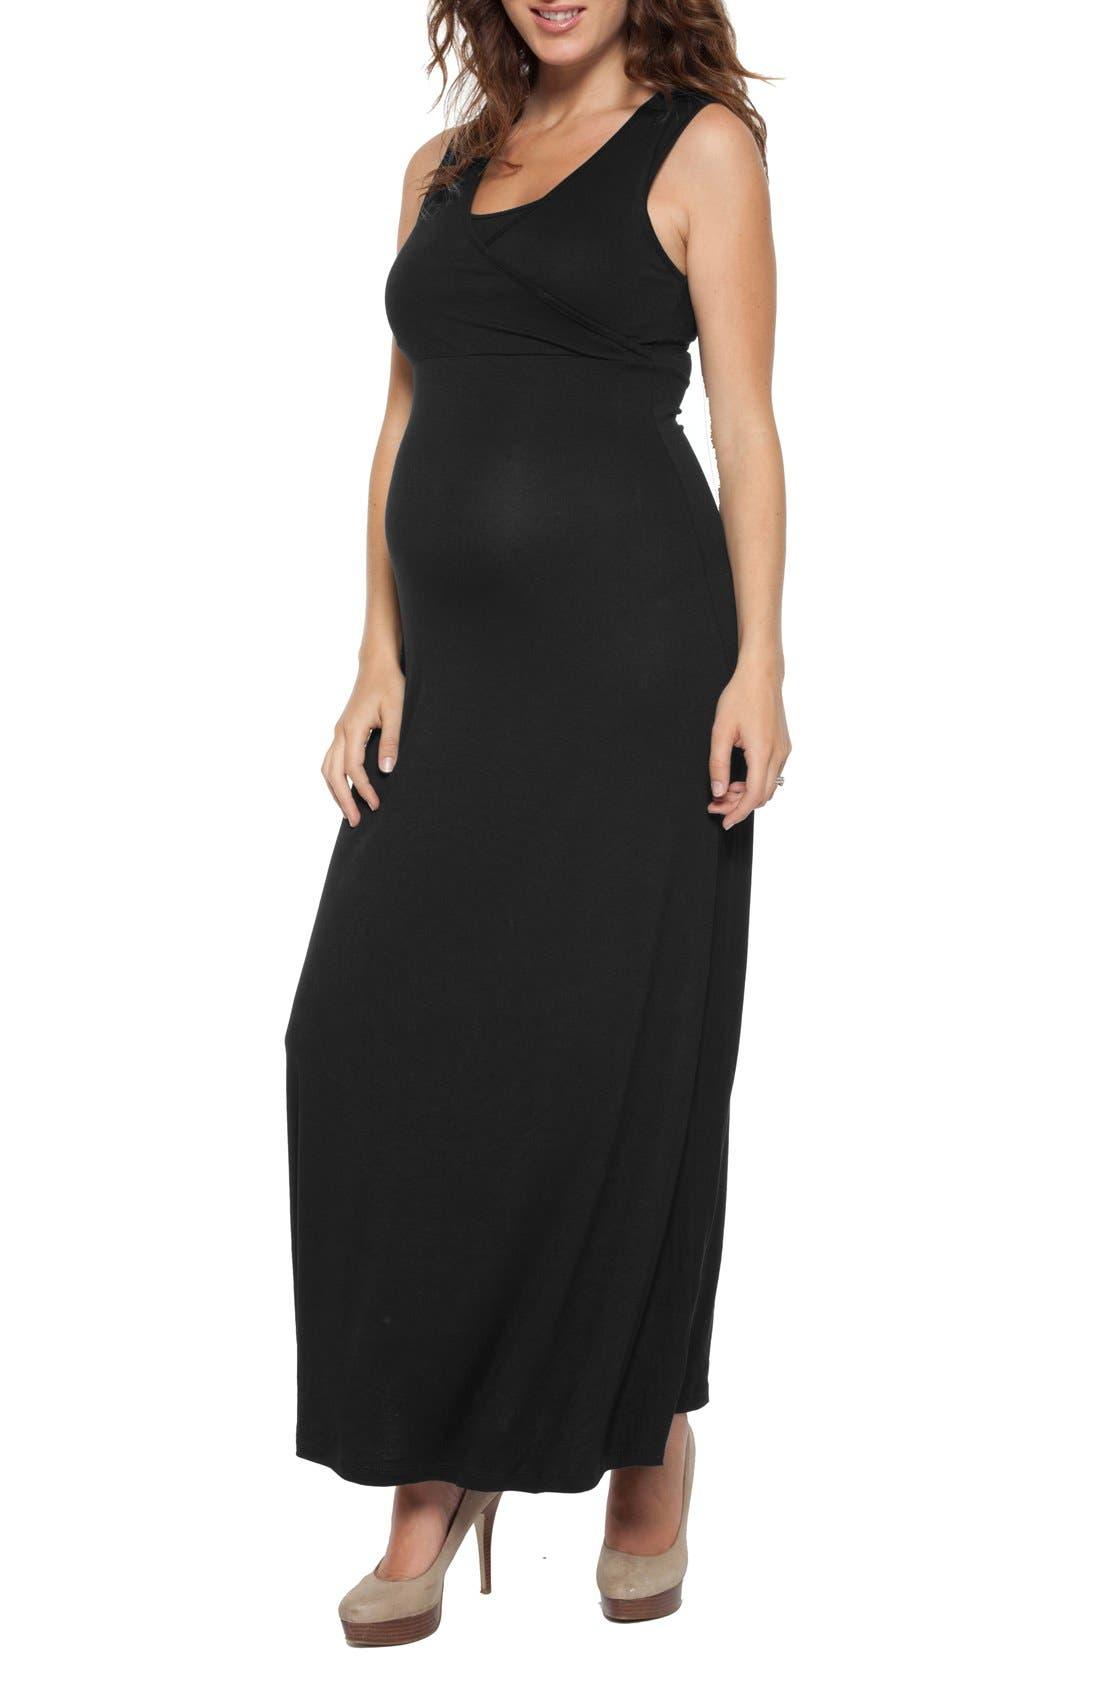 Alternate Image 1 Selected - Nom Maternity Jersey Maternity/Nursing Dress